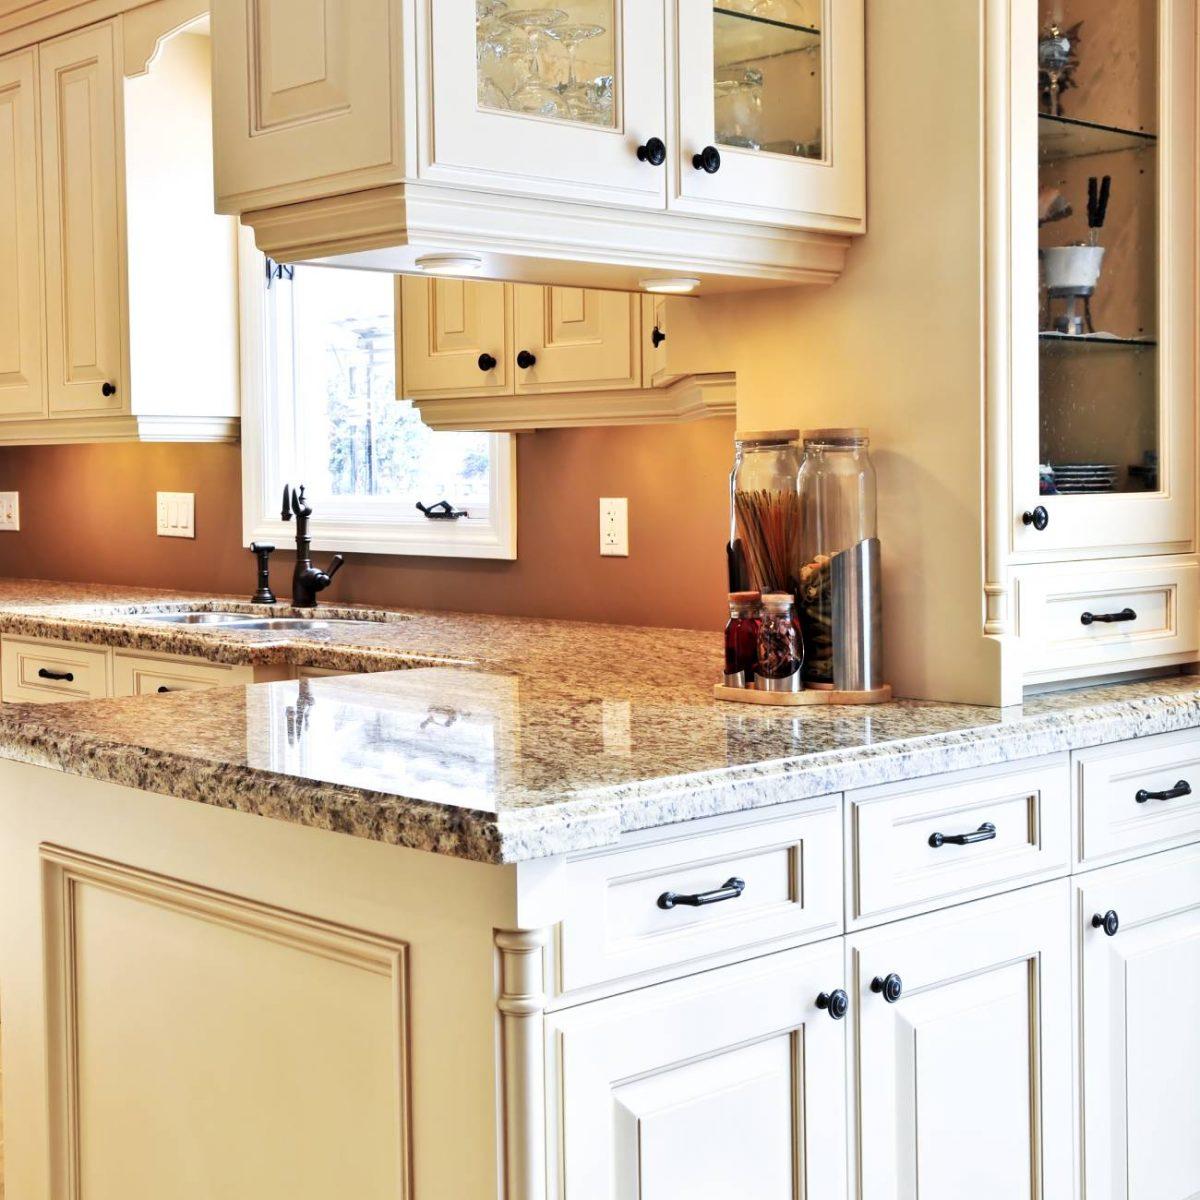 daybreak-utah-best-house-cleaning-service-sq